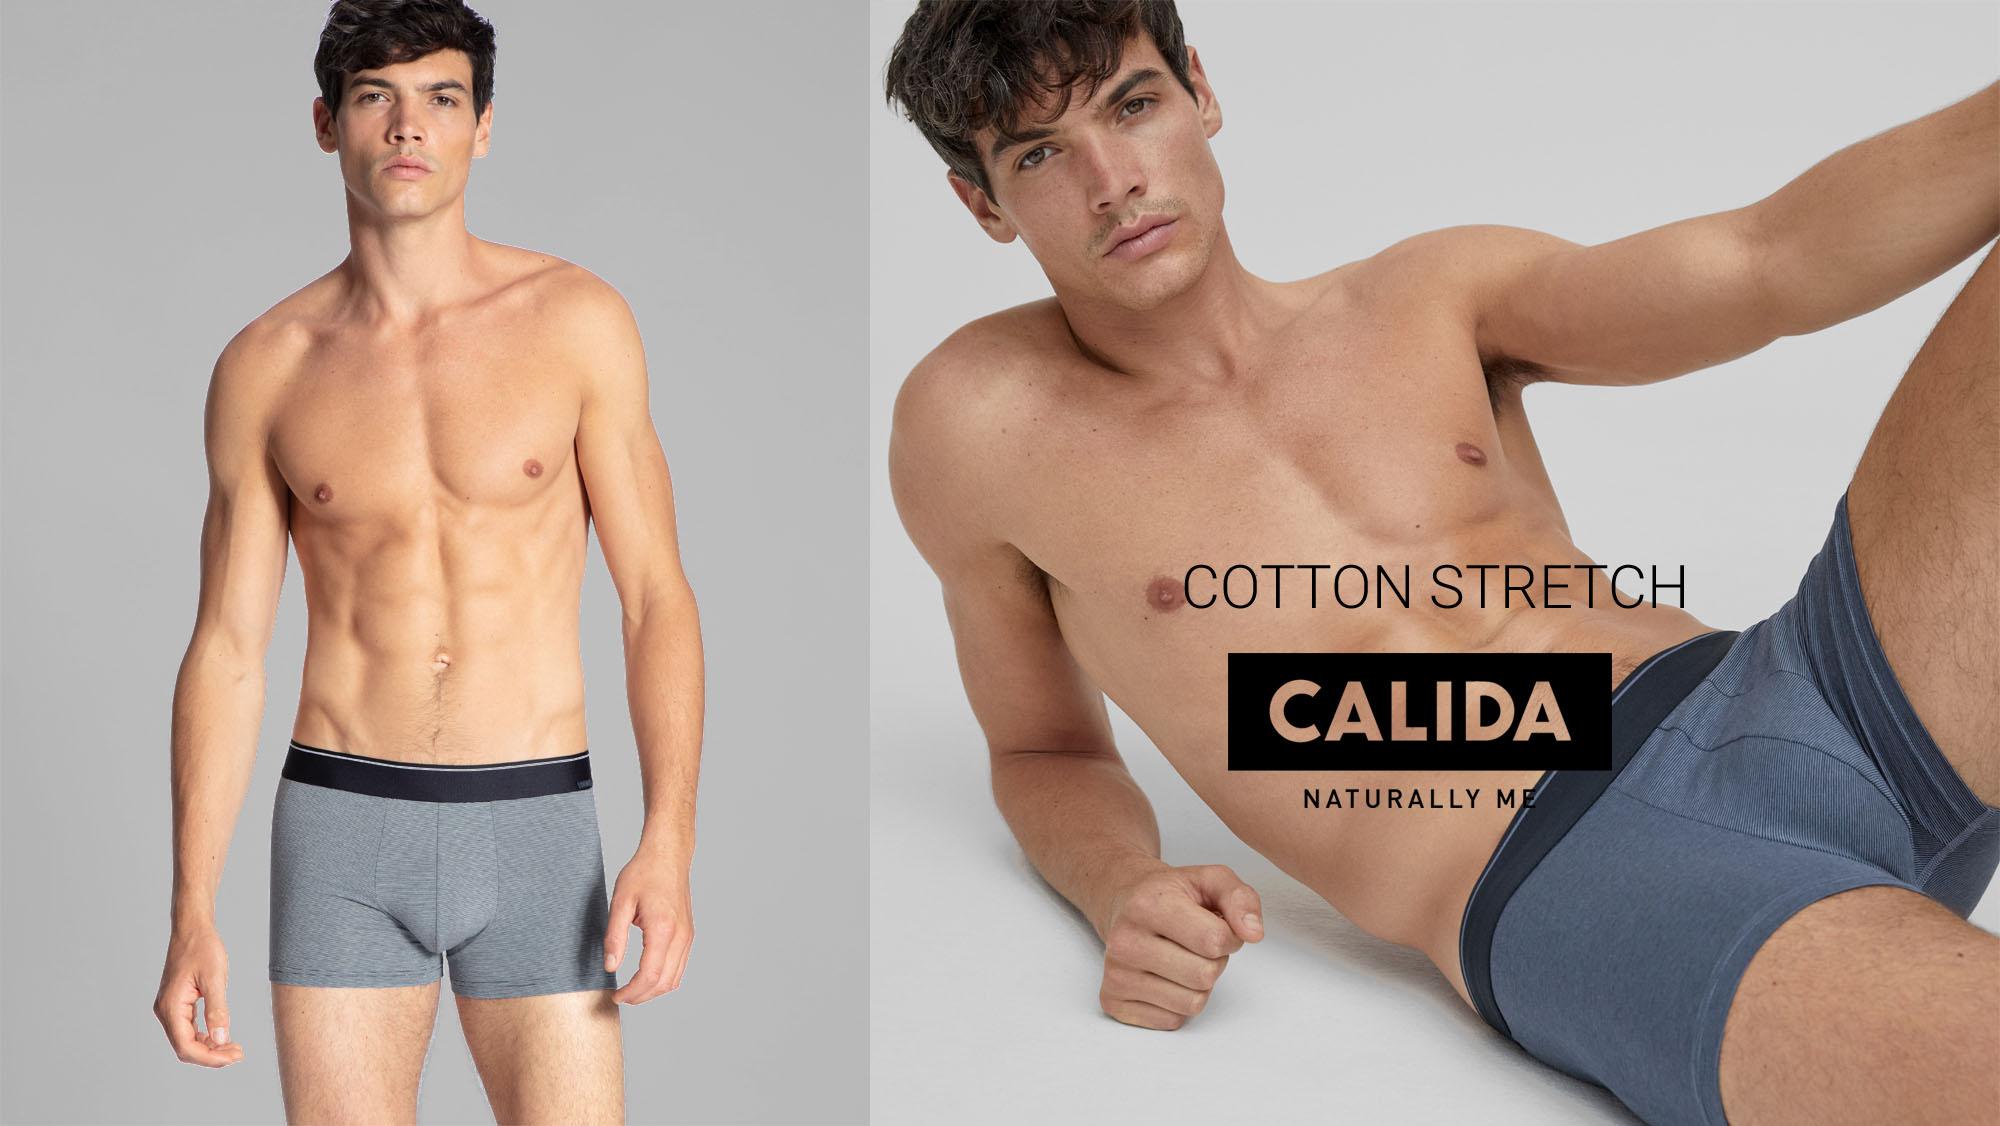 Calida Cotton Stretch